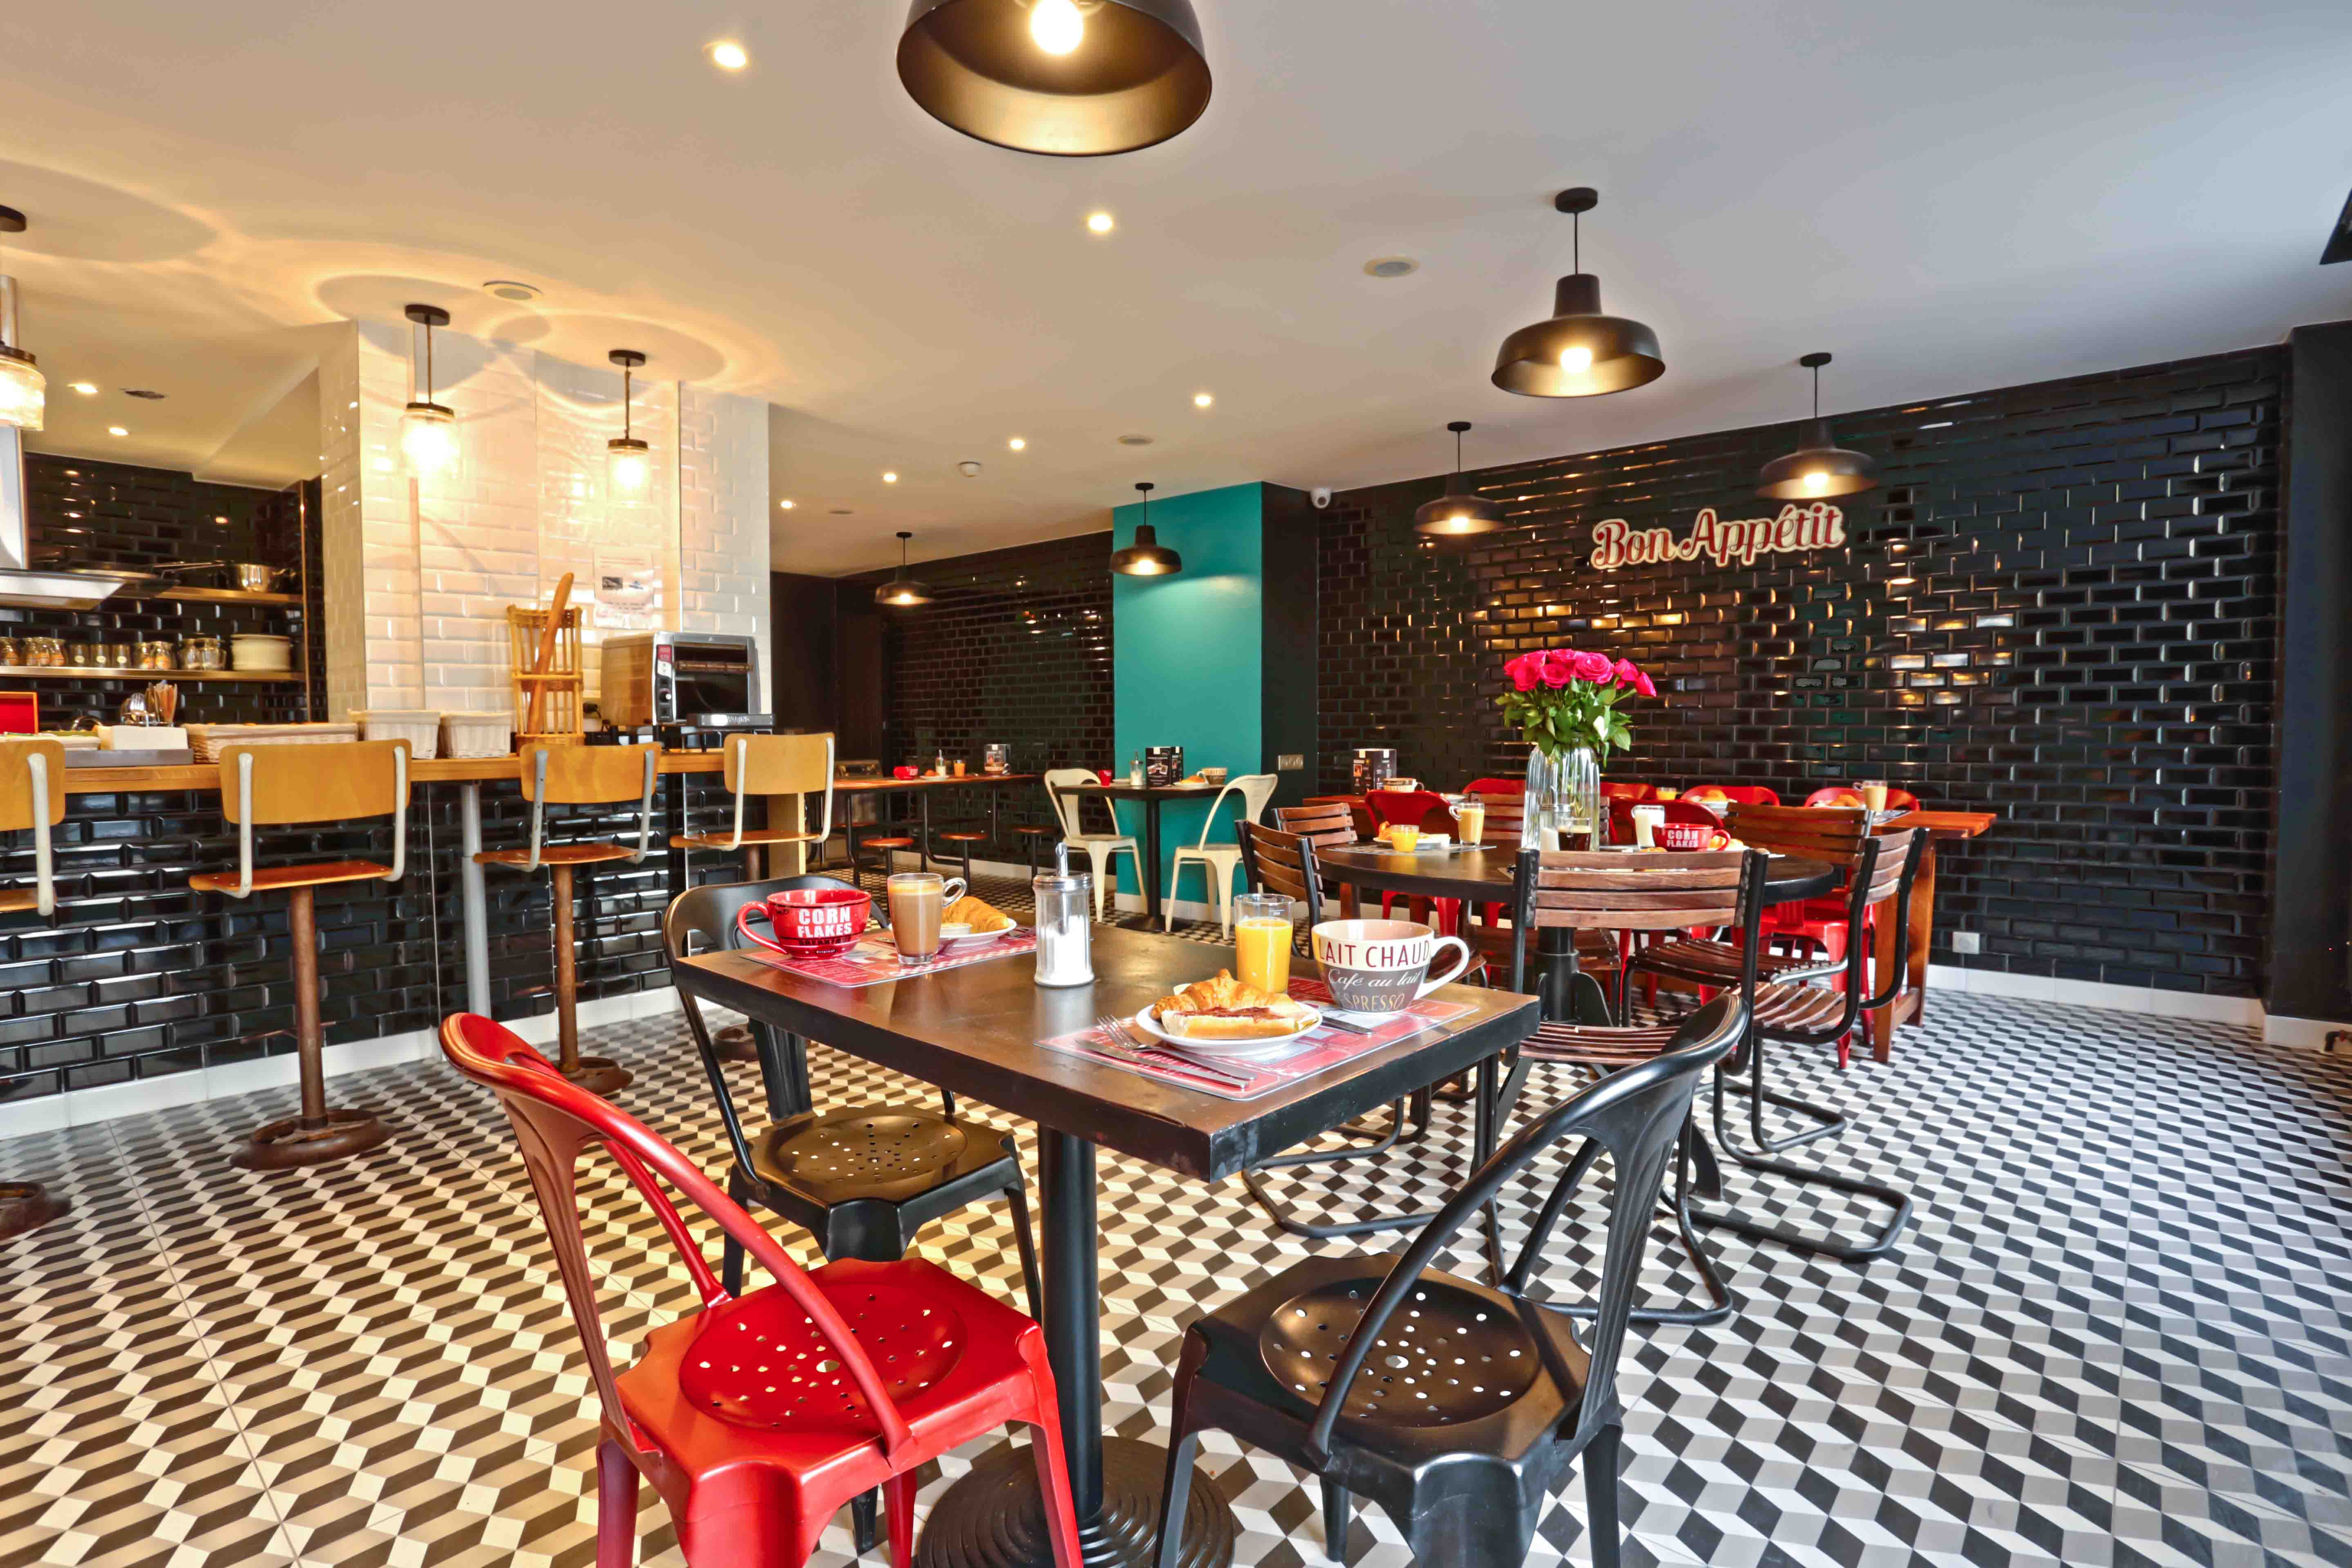 hotel hostel paris arty le village montmartre. Black Bedroom Furniture Sets. Home Design Ideas